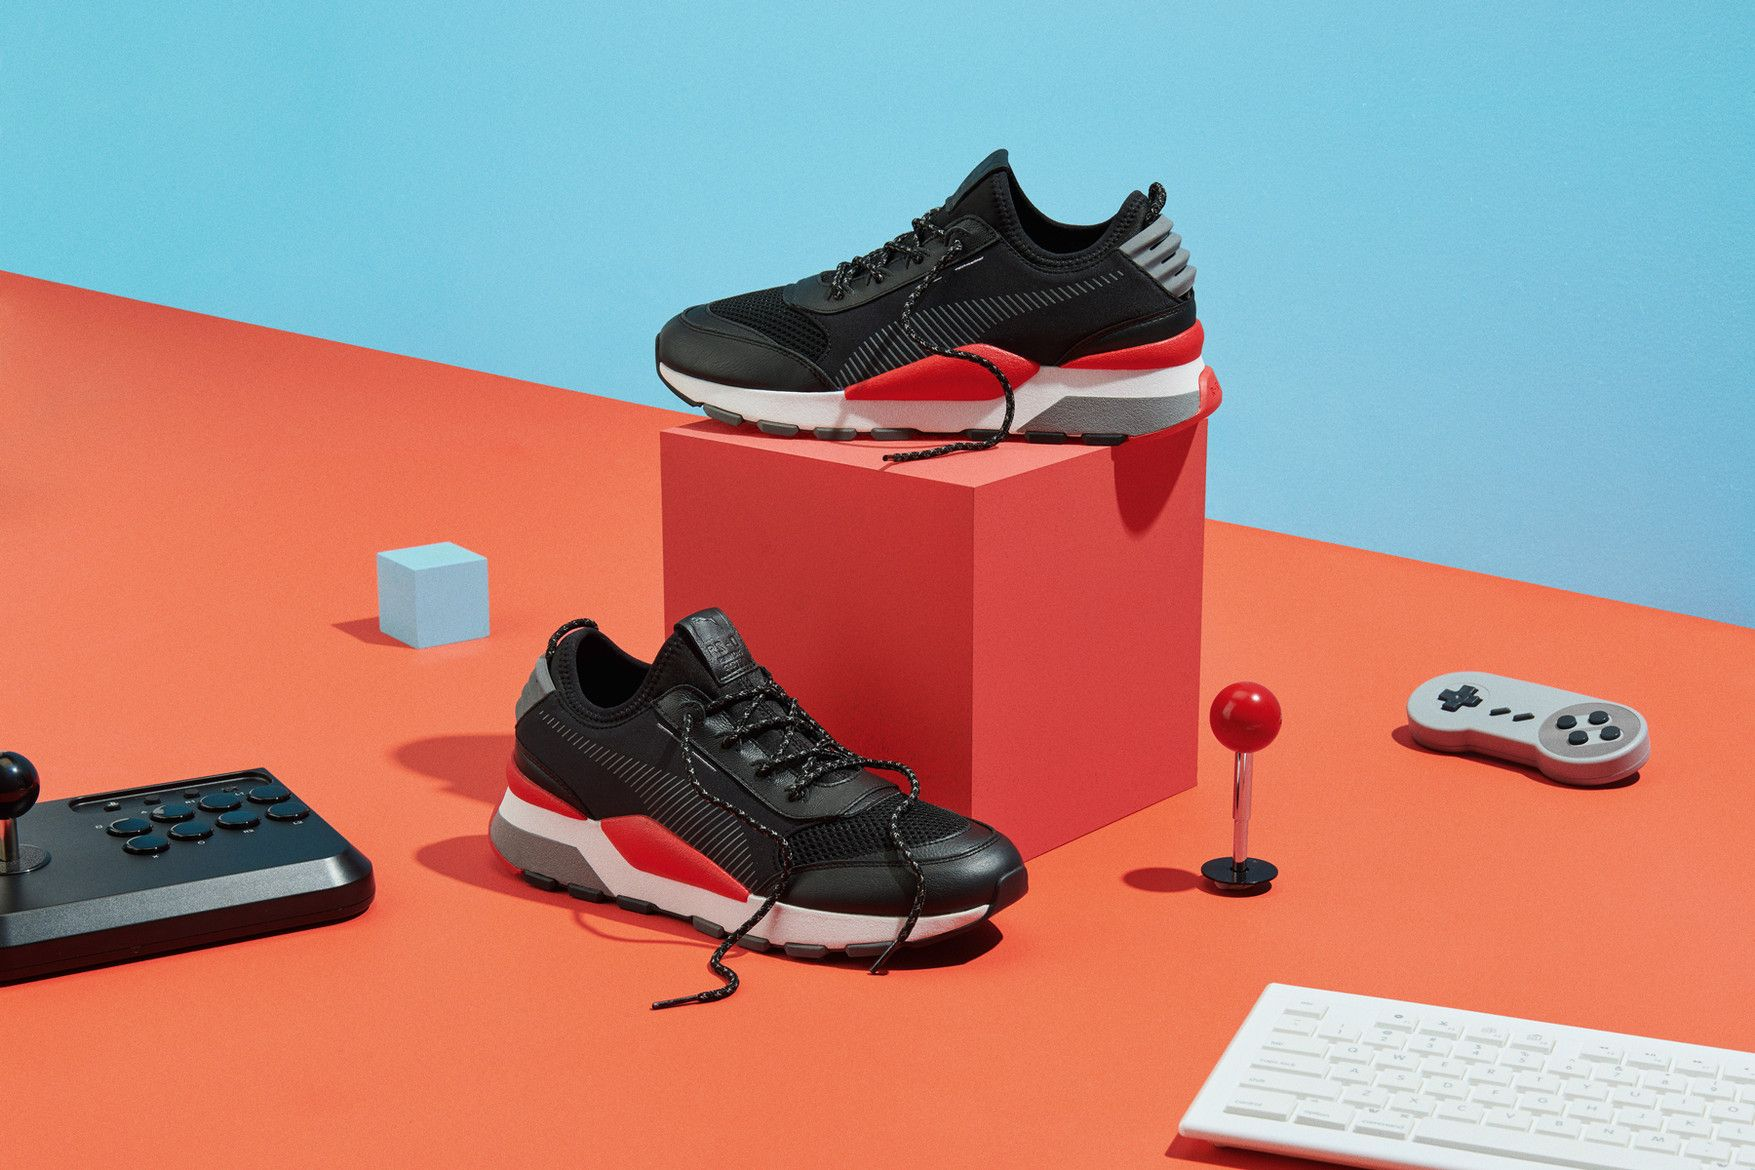 PUMA RS-0 Play shoes video games 80s nes nintendo pink white teal grey  yellow running black red dc057da5eb4b